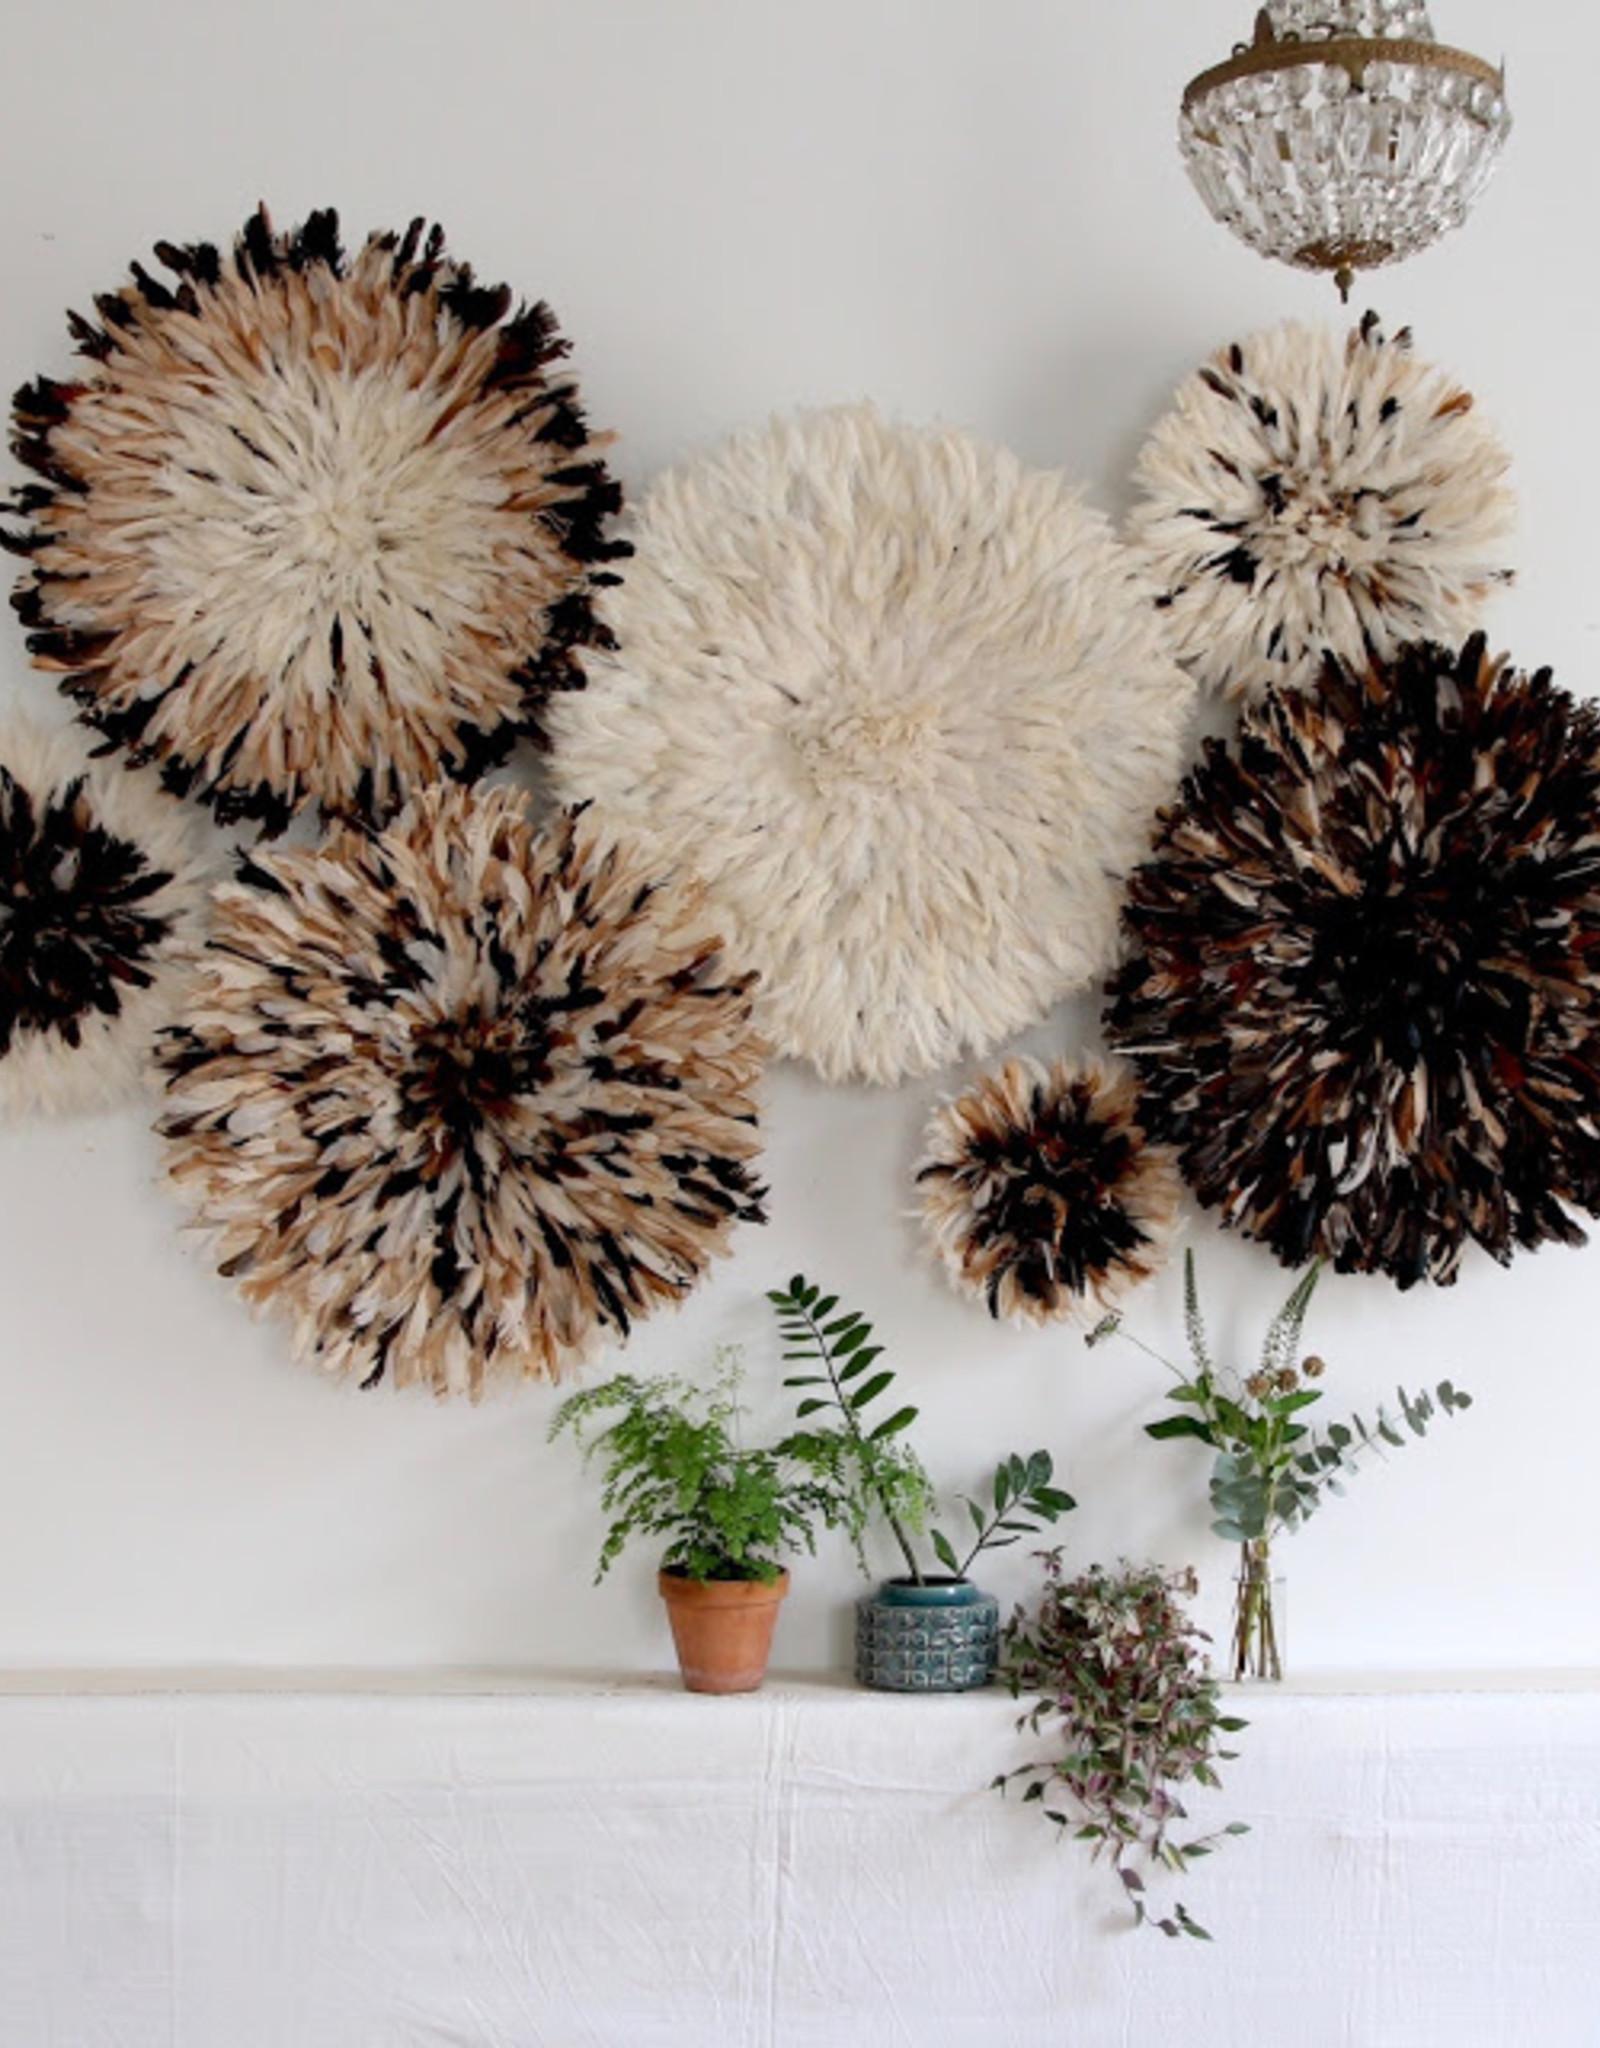 Juju hats - Standard - Natural black/white/Black